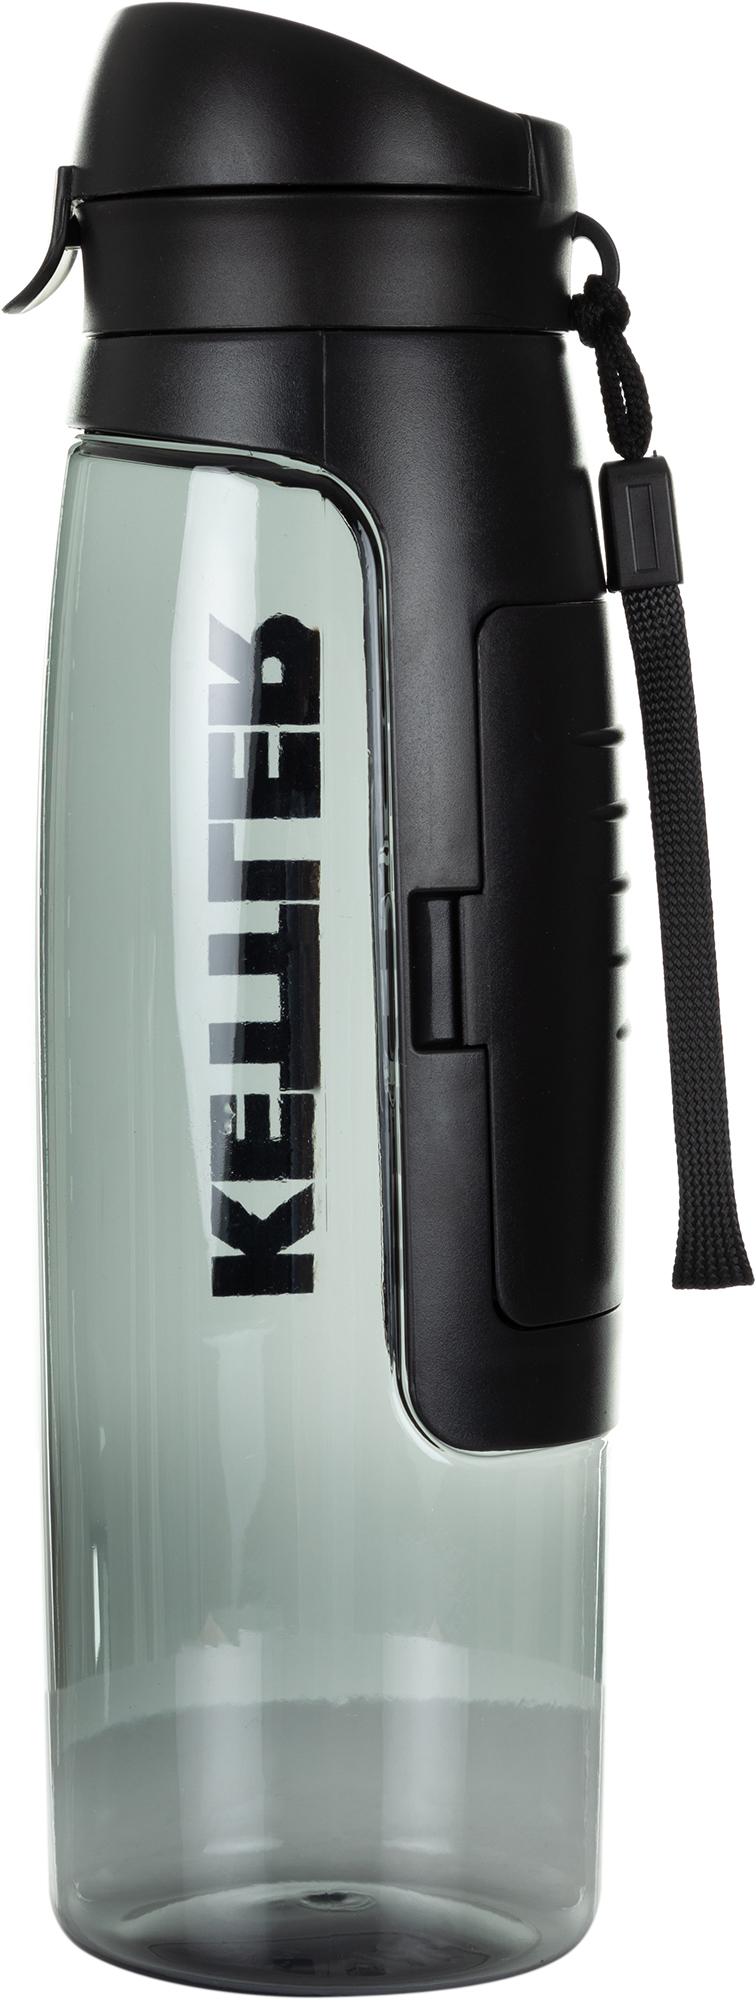 купить Kettler Бутылка для воды Kettler по цене 999 рублей